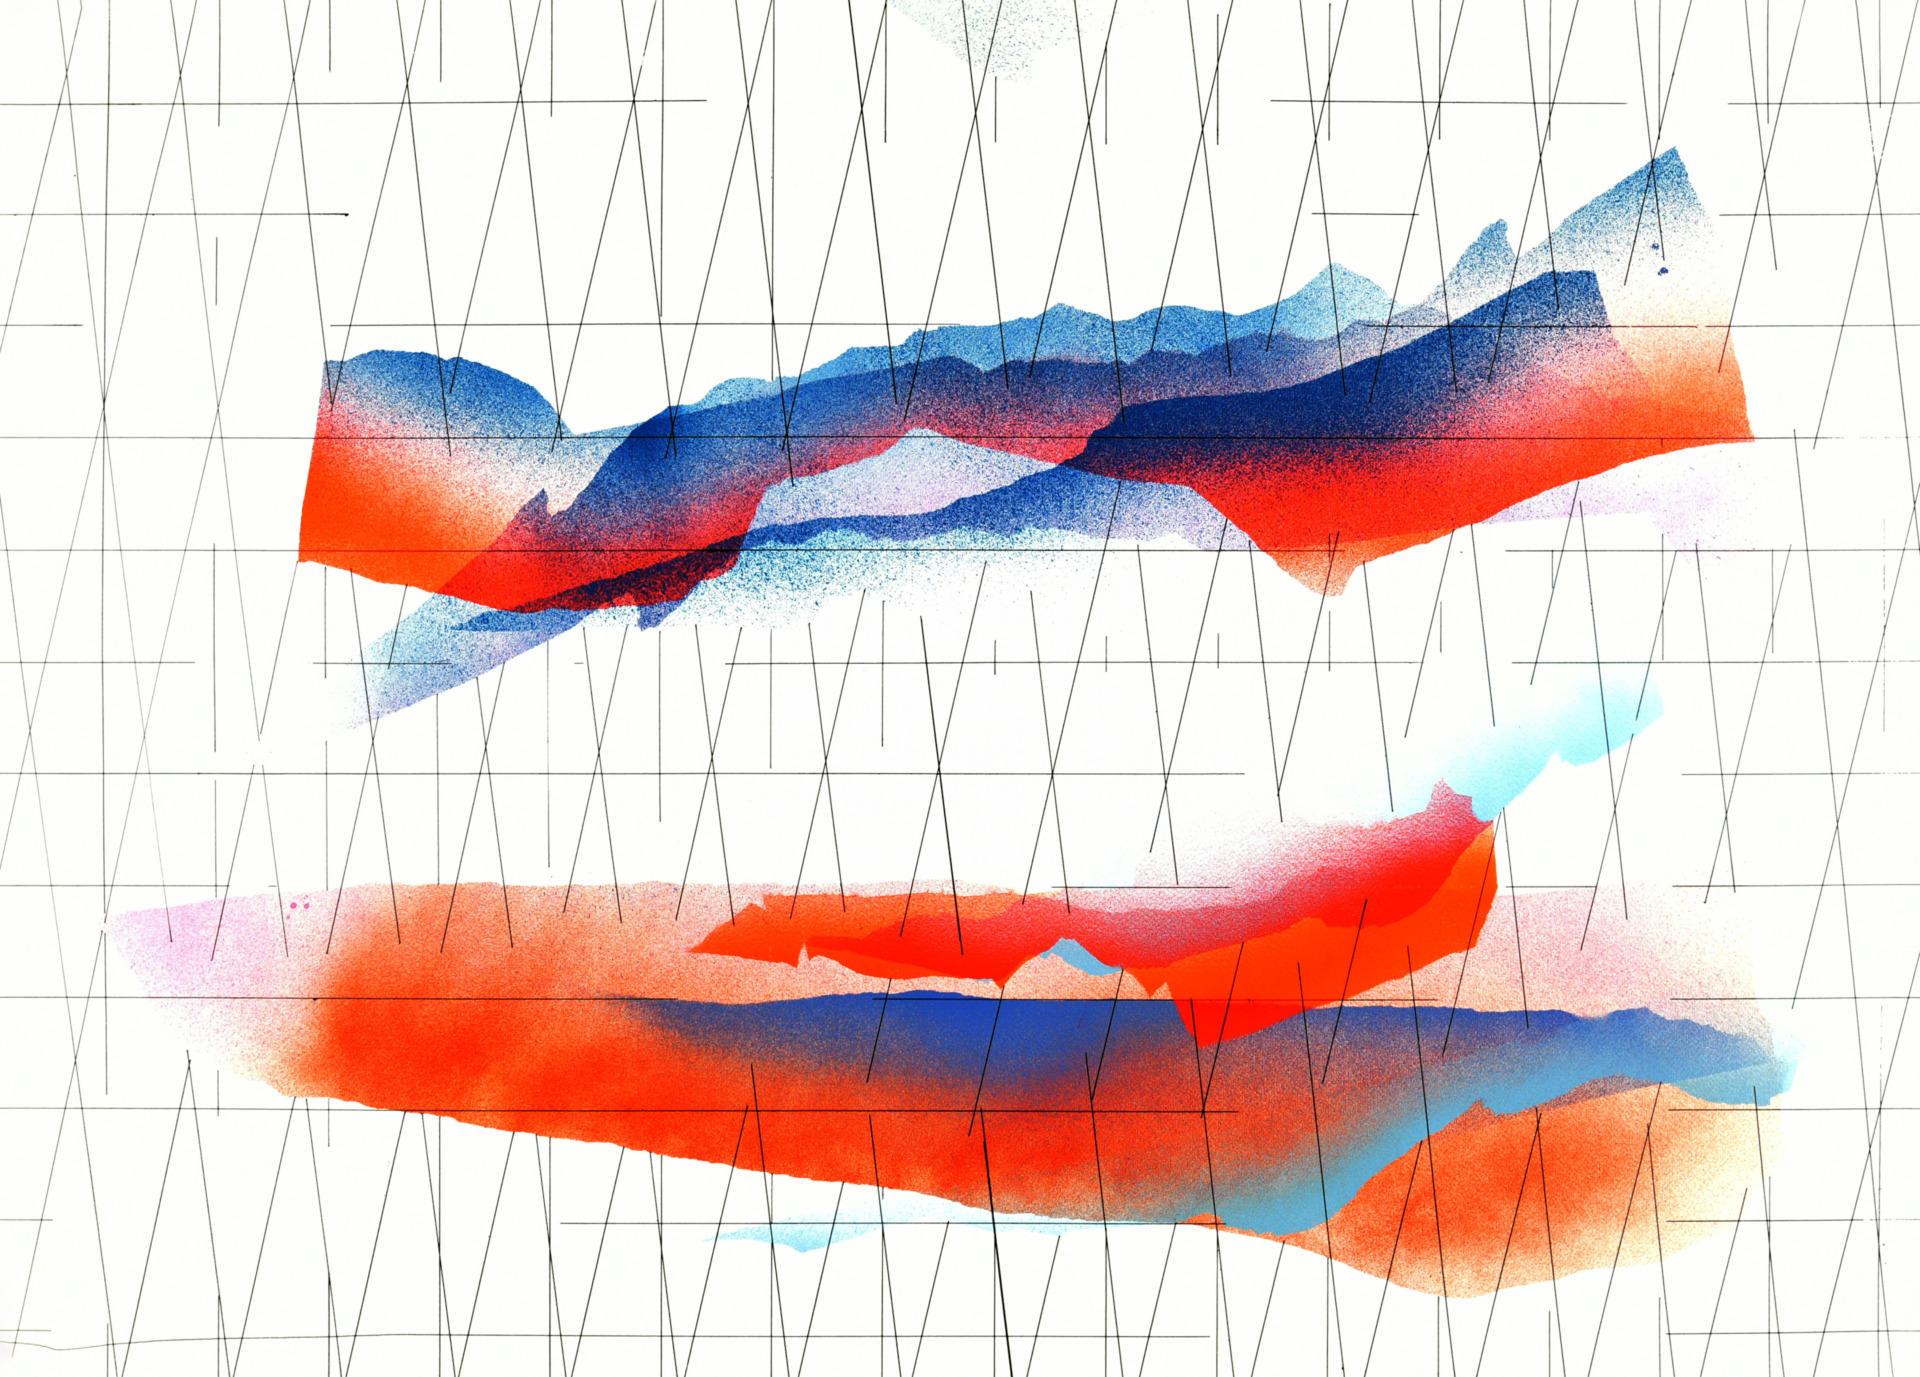 op. 211219. acrylic on paper, 75x105cm